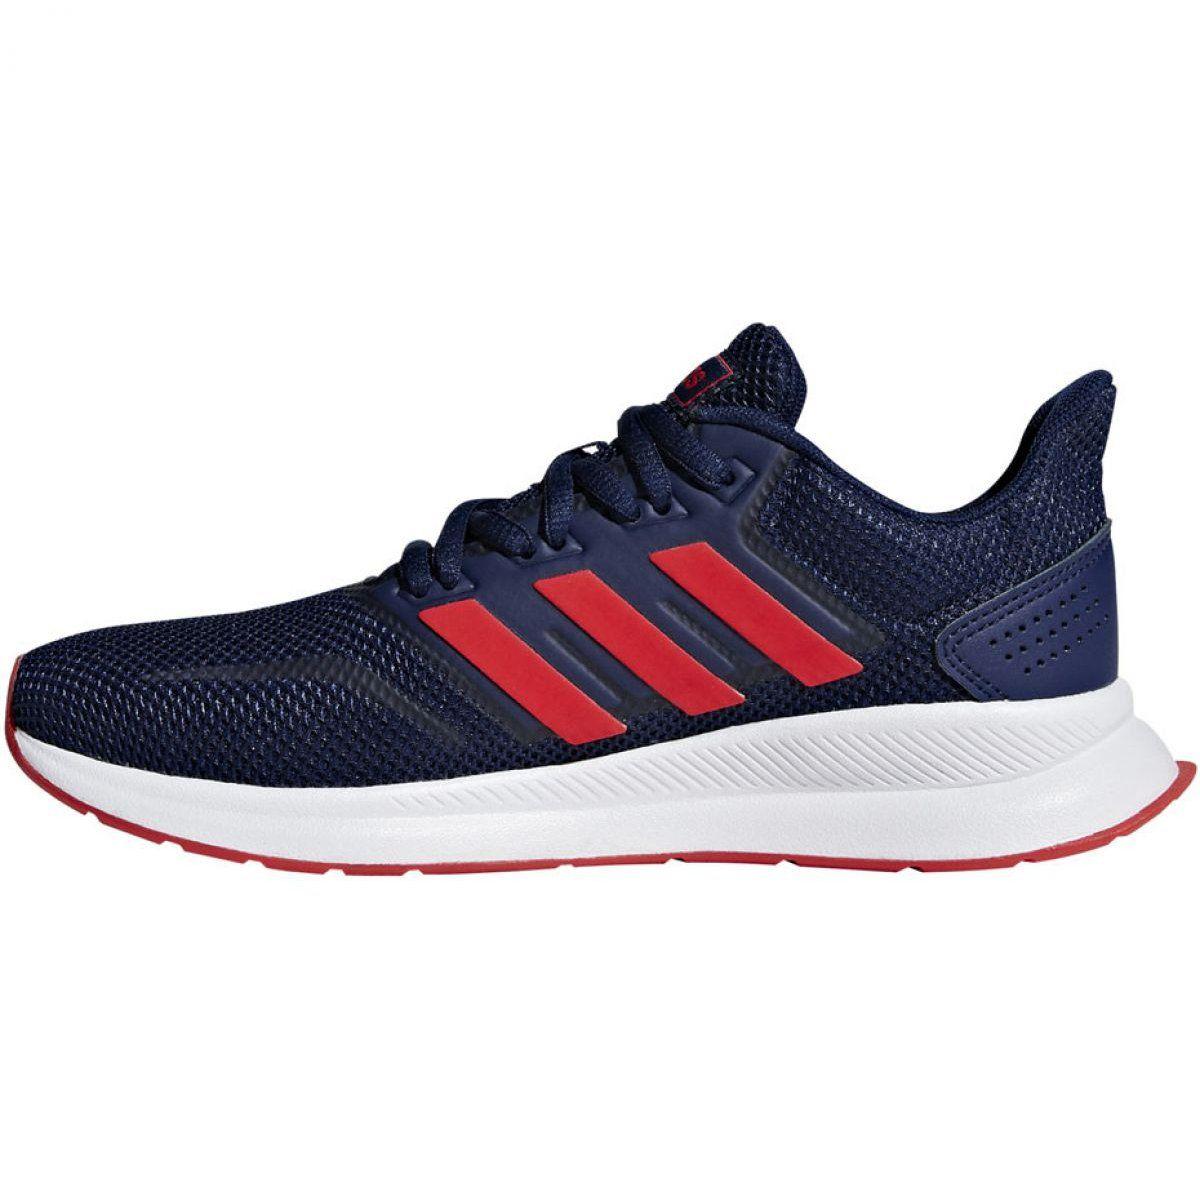 Treningowe Bieganie Sport Adidas Granatowe Buty Biegowe Adidas Falcon K Jr F36543 Adidas Adidas Running Shoes Running Shoes